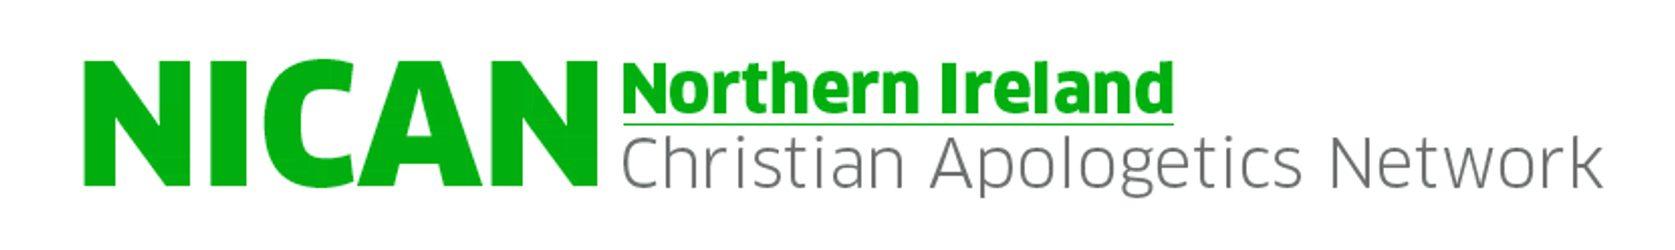 Northern Ireland Christian Apologetics Network